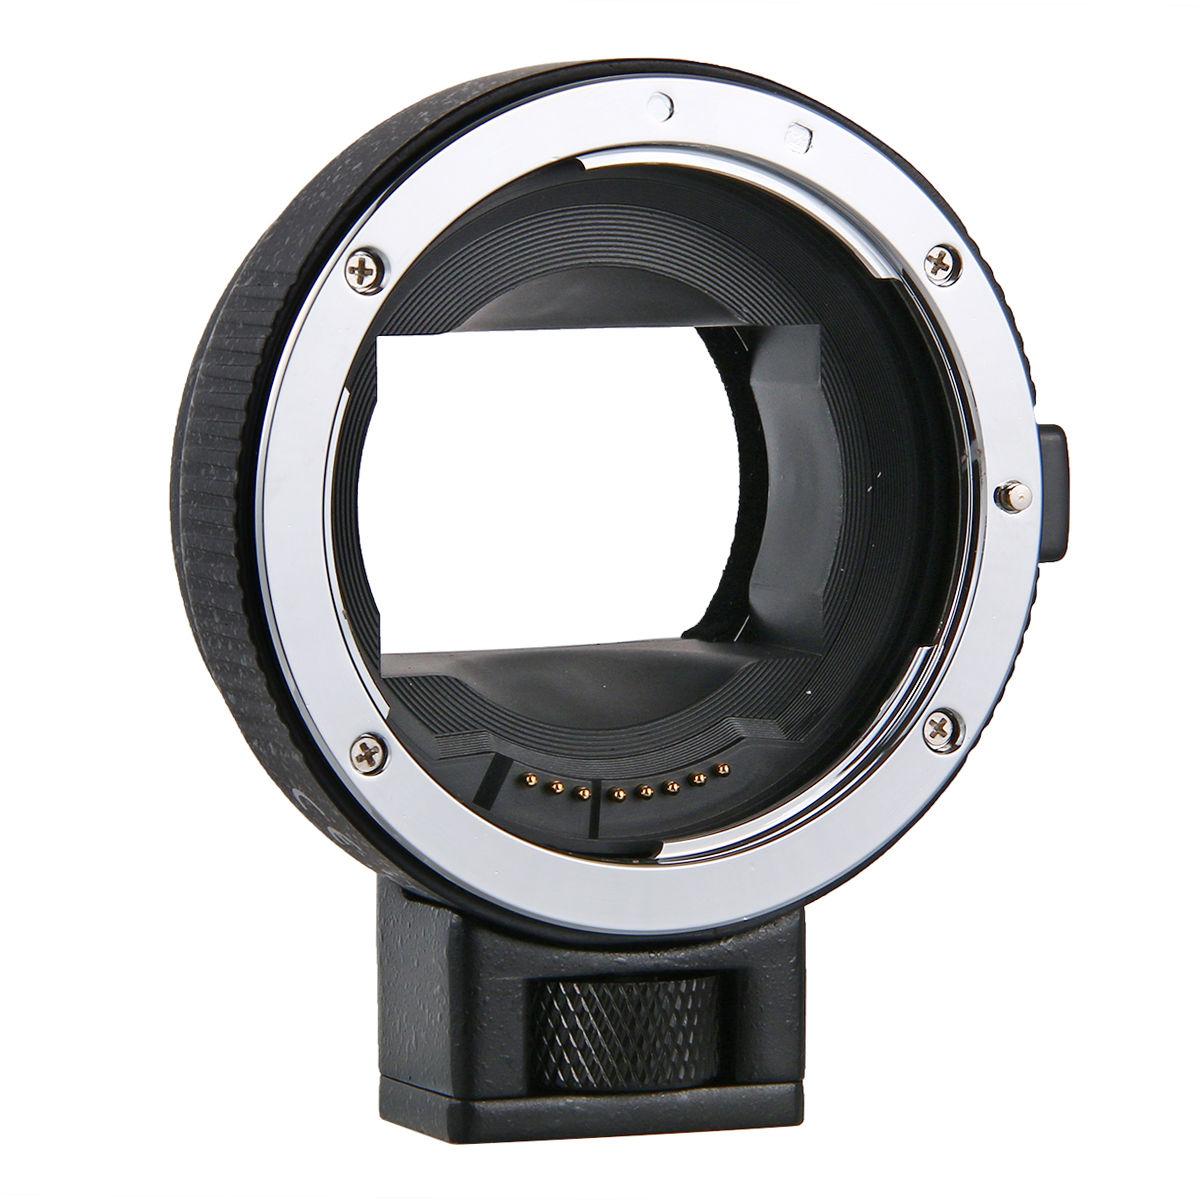 EFNEX II自动对焦转接环 佳能EOS镜头转索尼微单相机A7R电子光圈